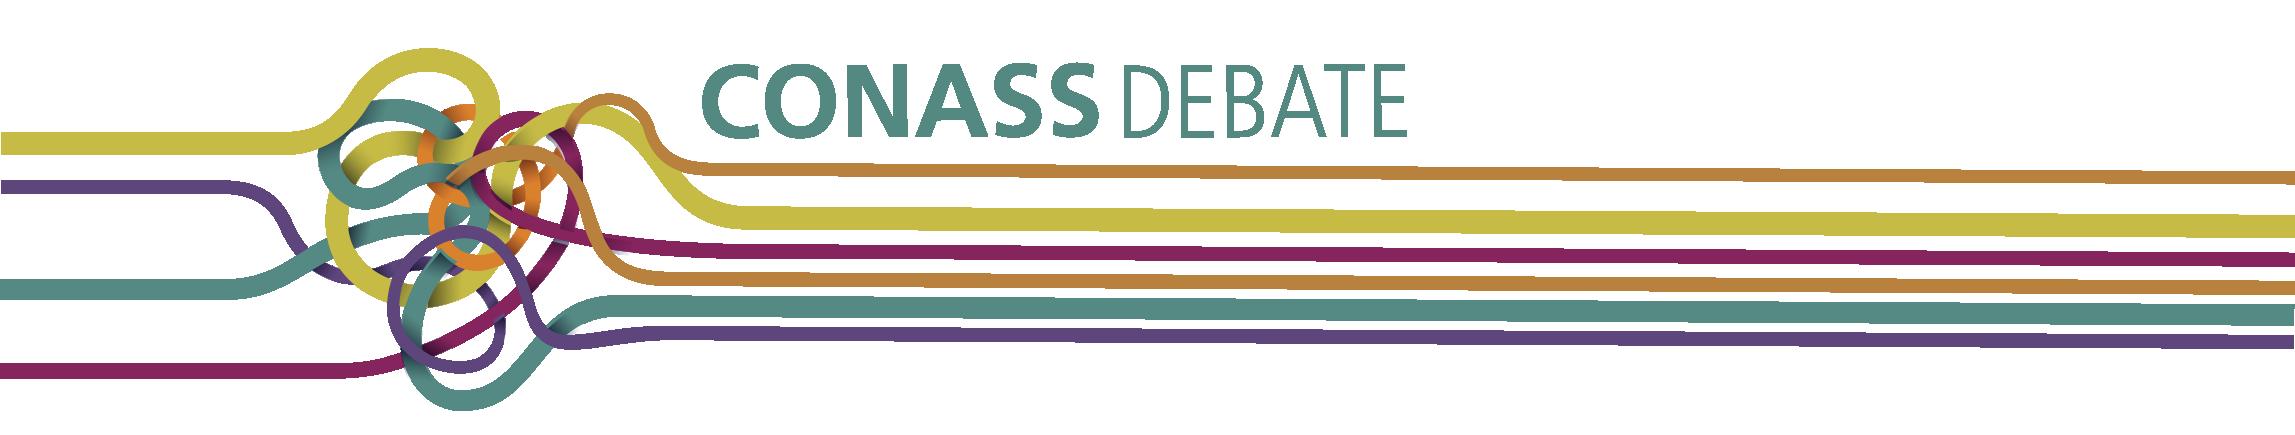 conass-debate-logo-01